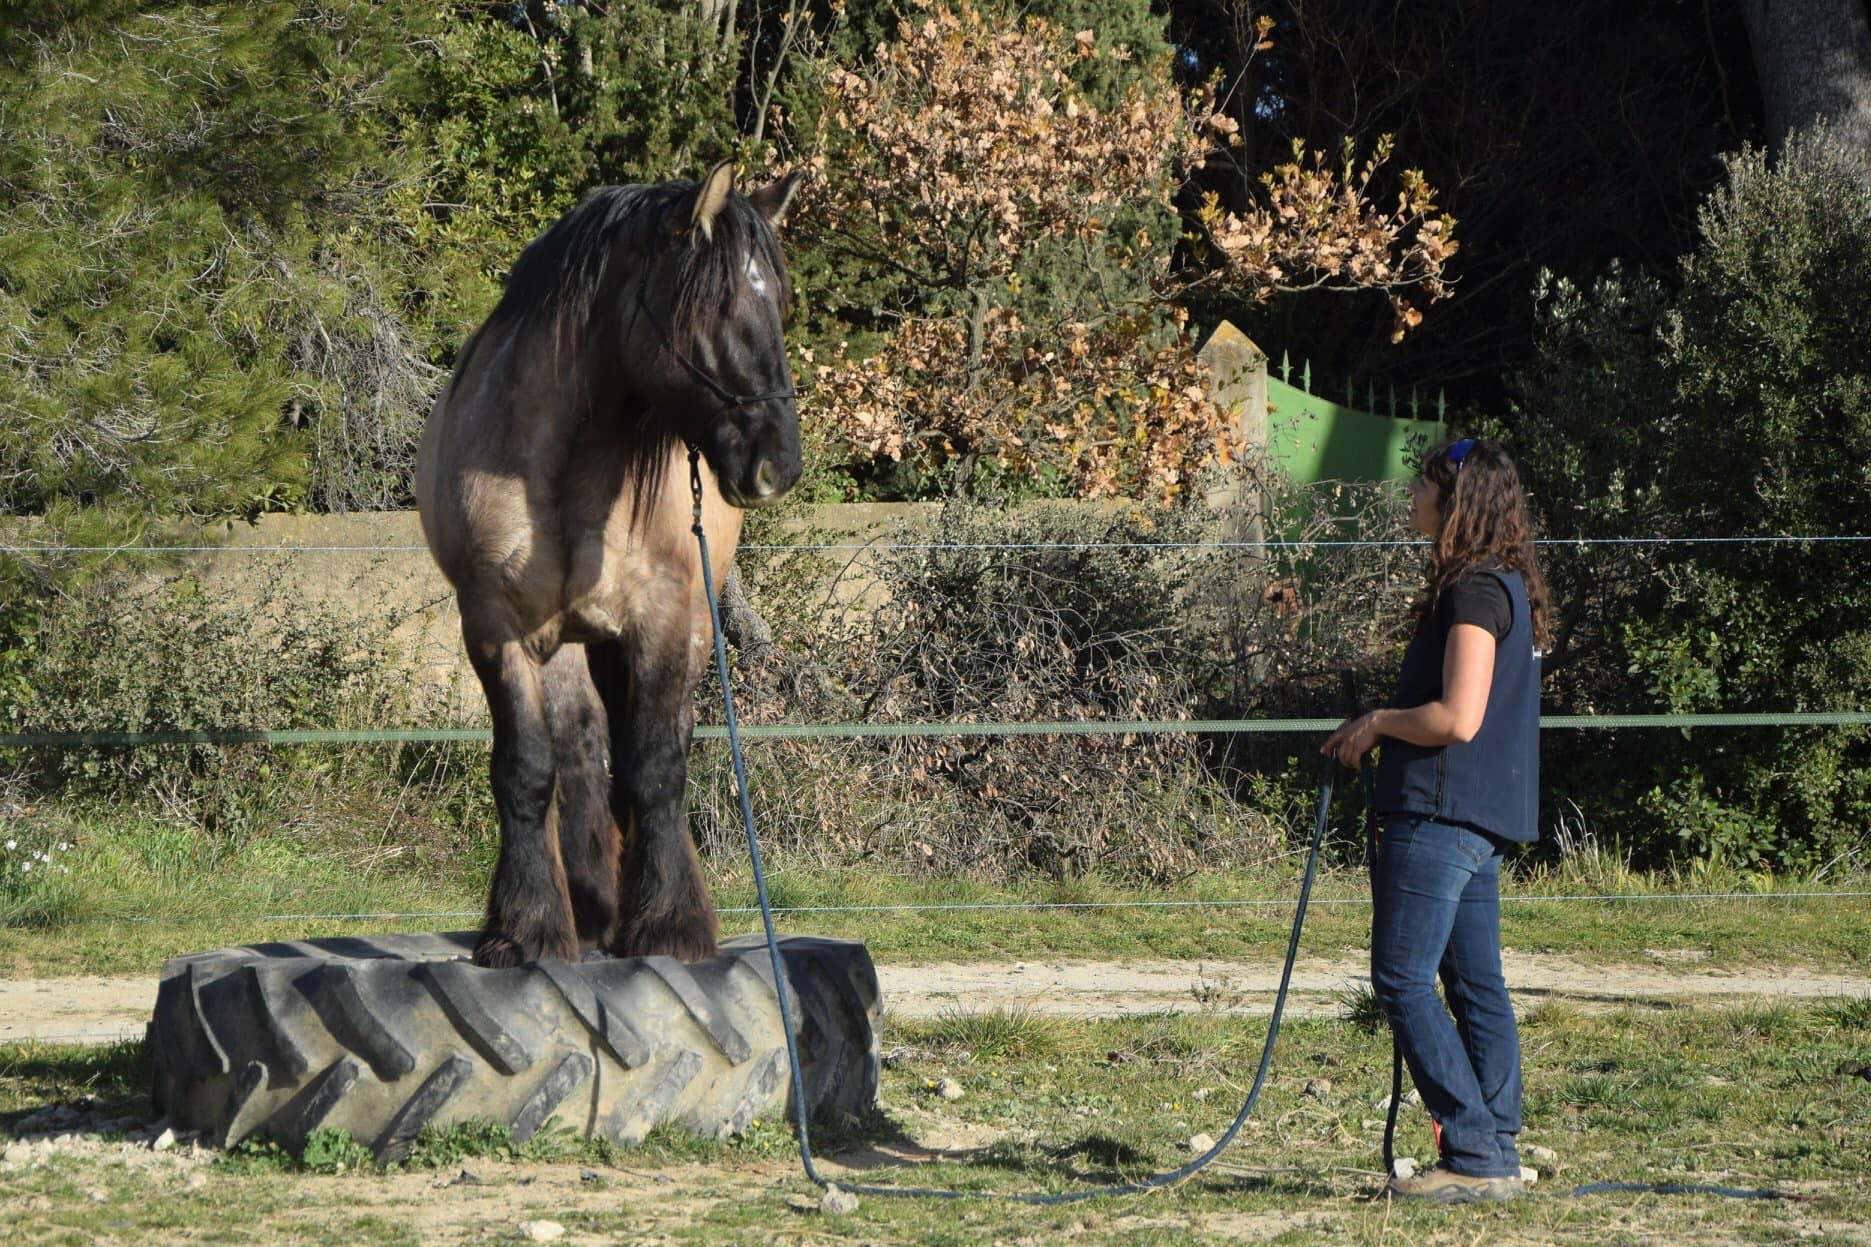 Le programme Parelli Natural Horsemanship